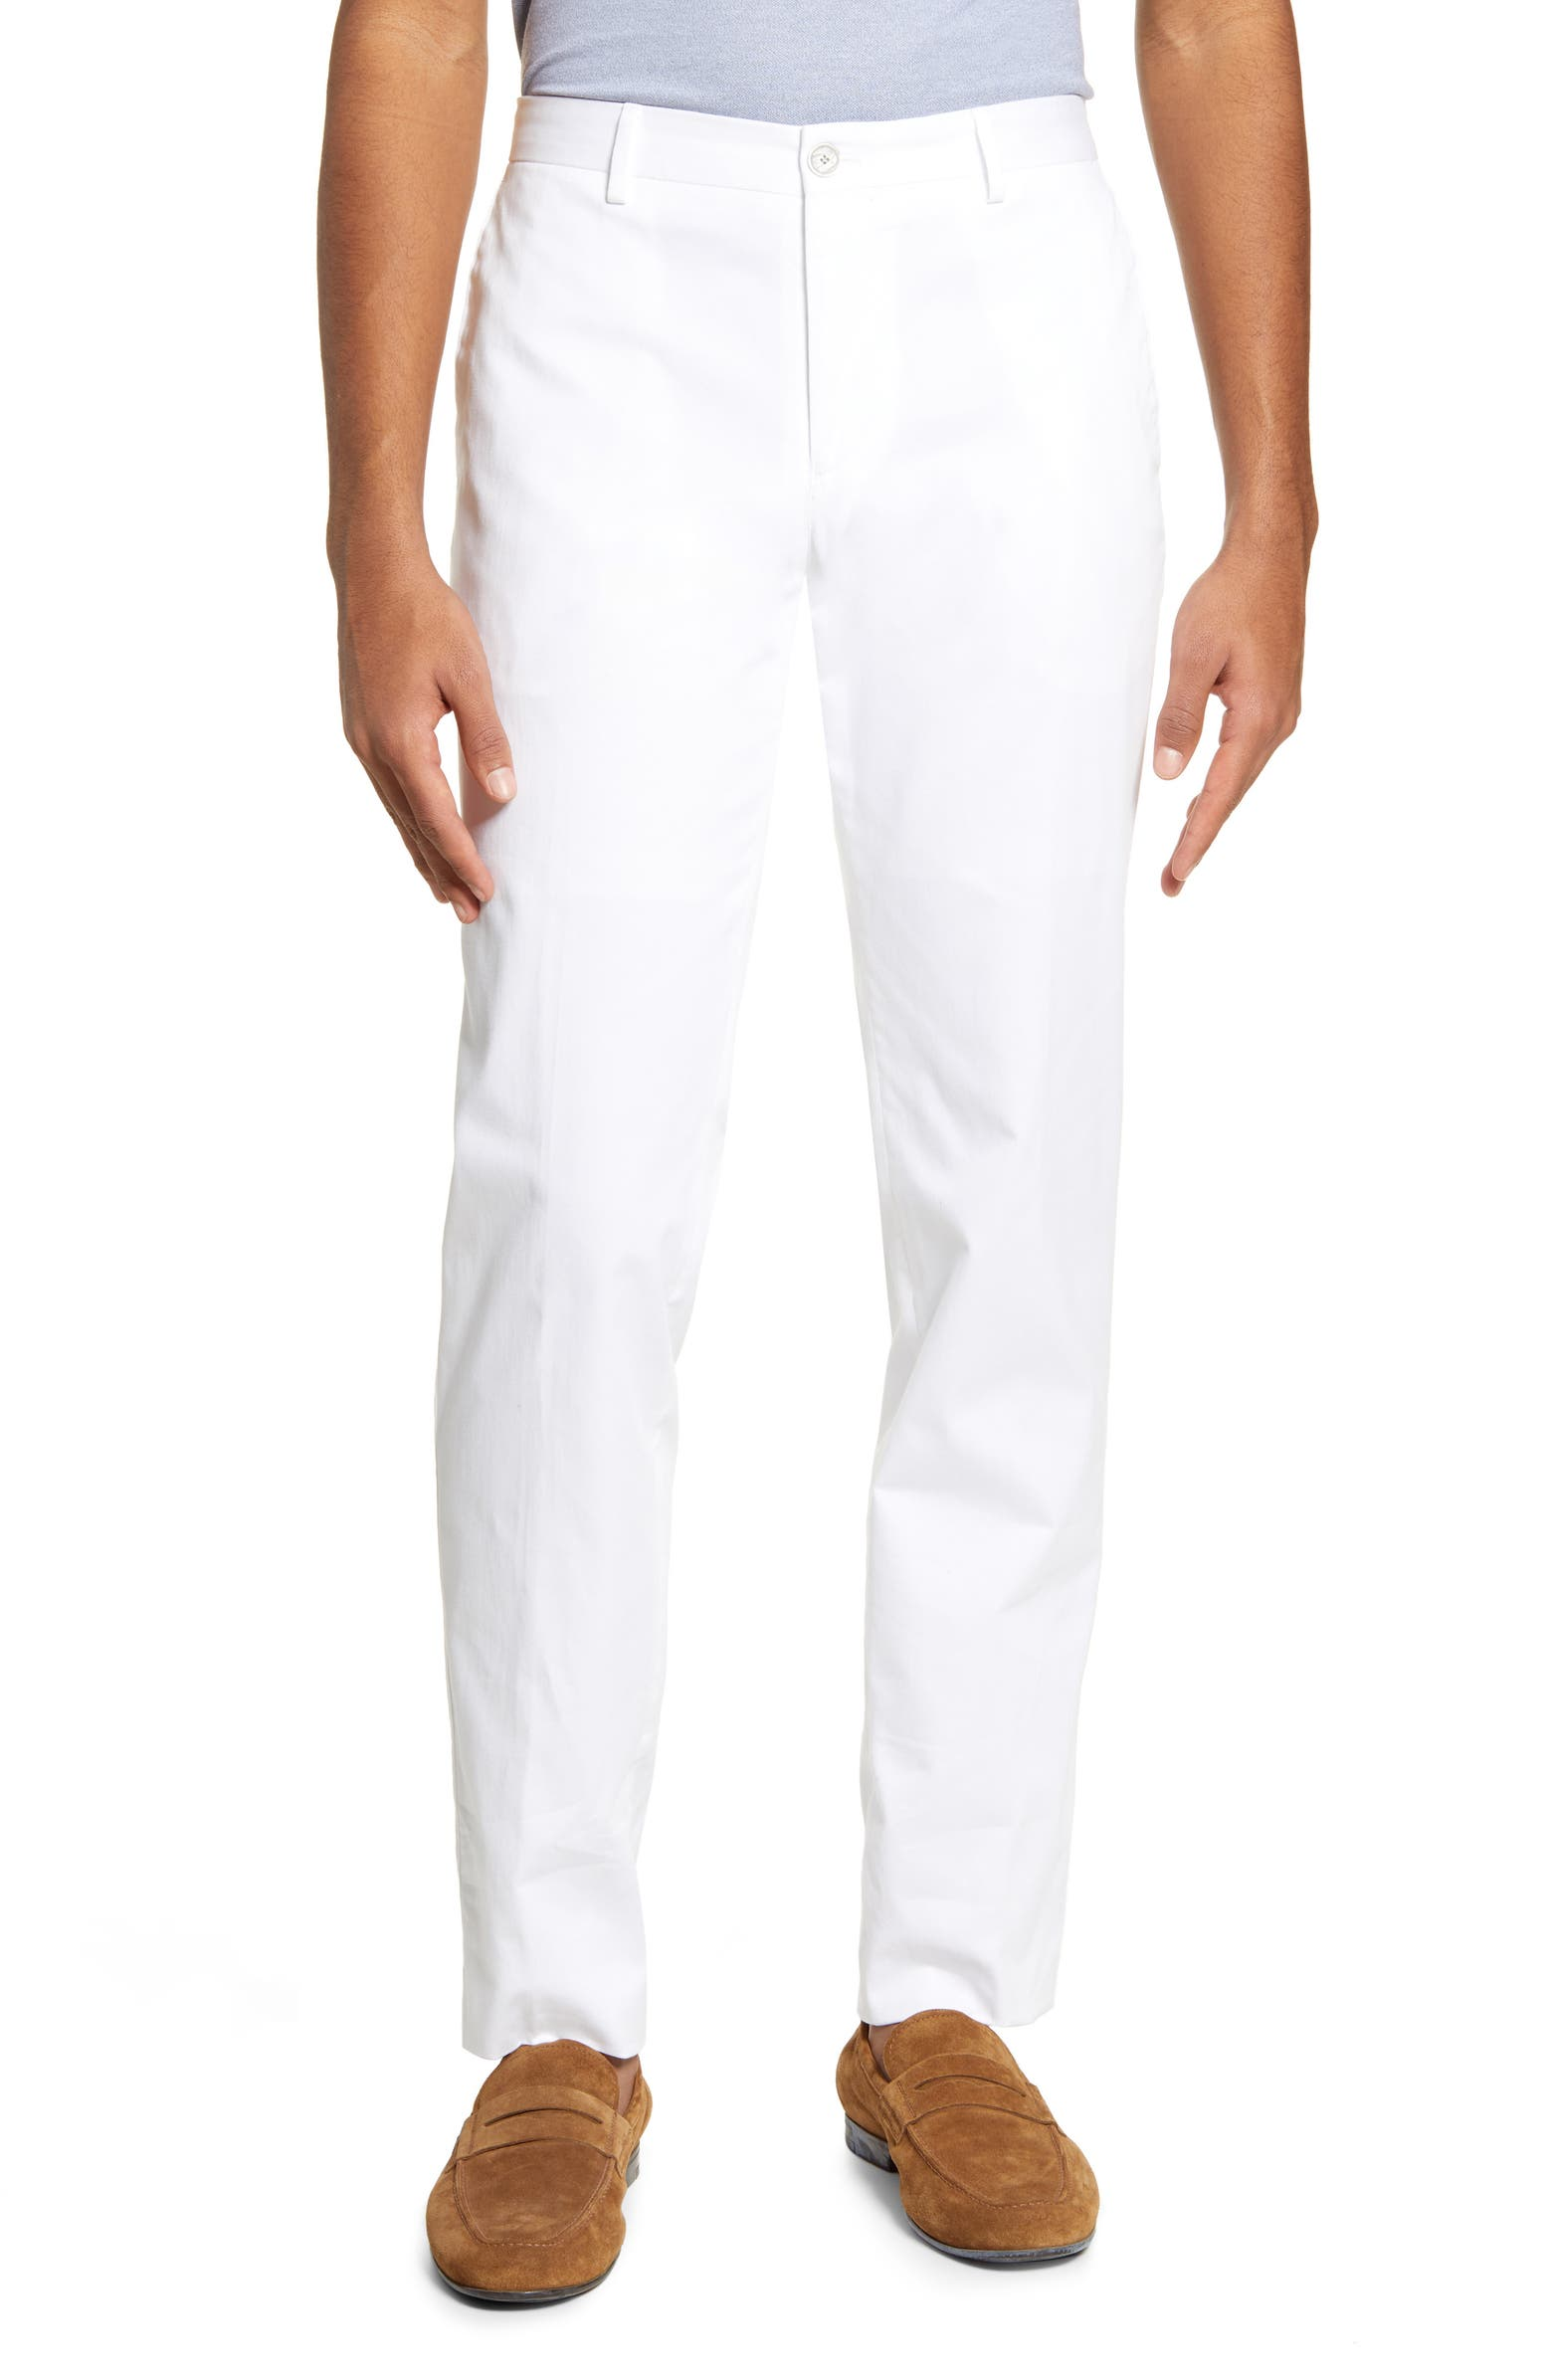 Stanino Slim Fit Stretch Chino Pants BOSS